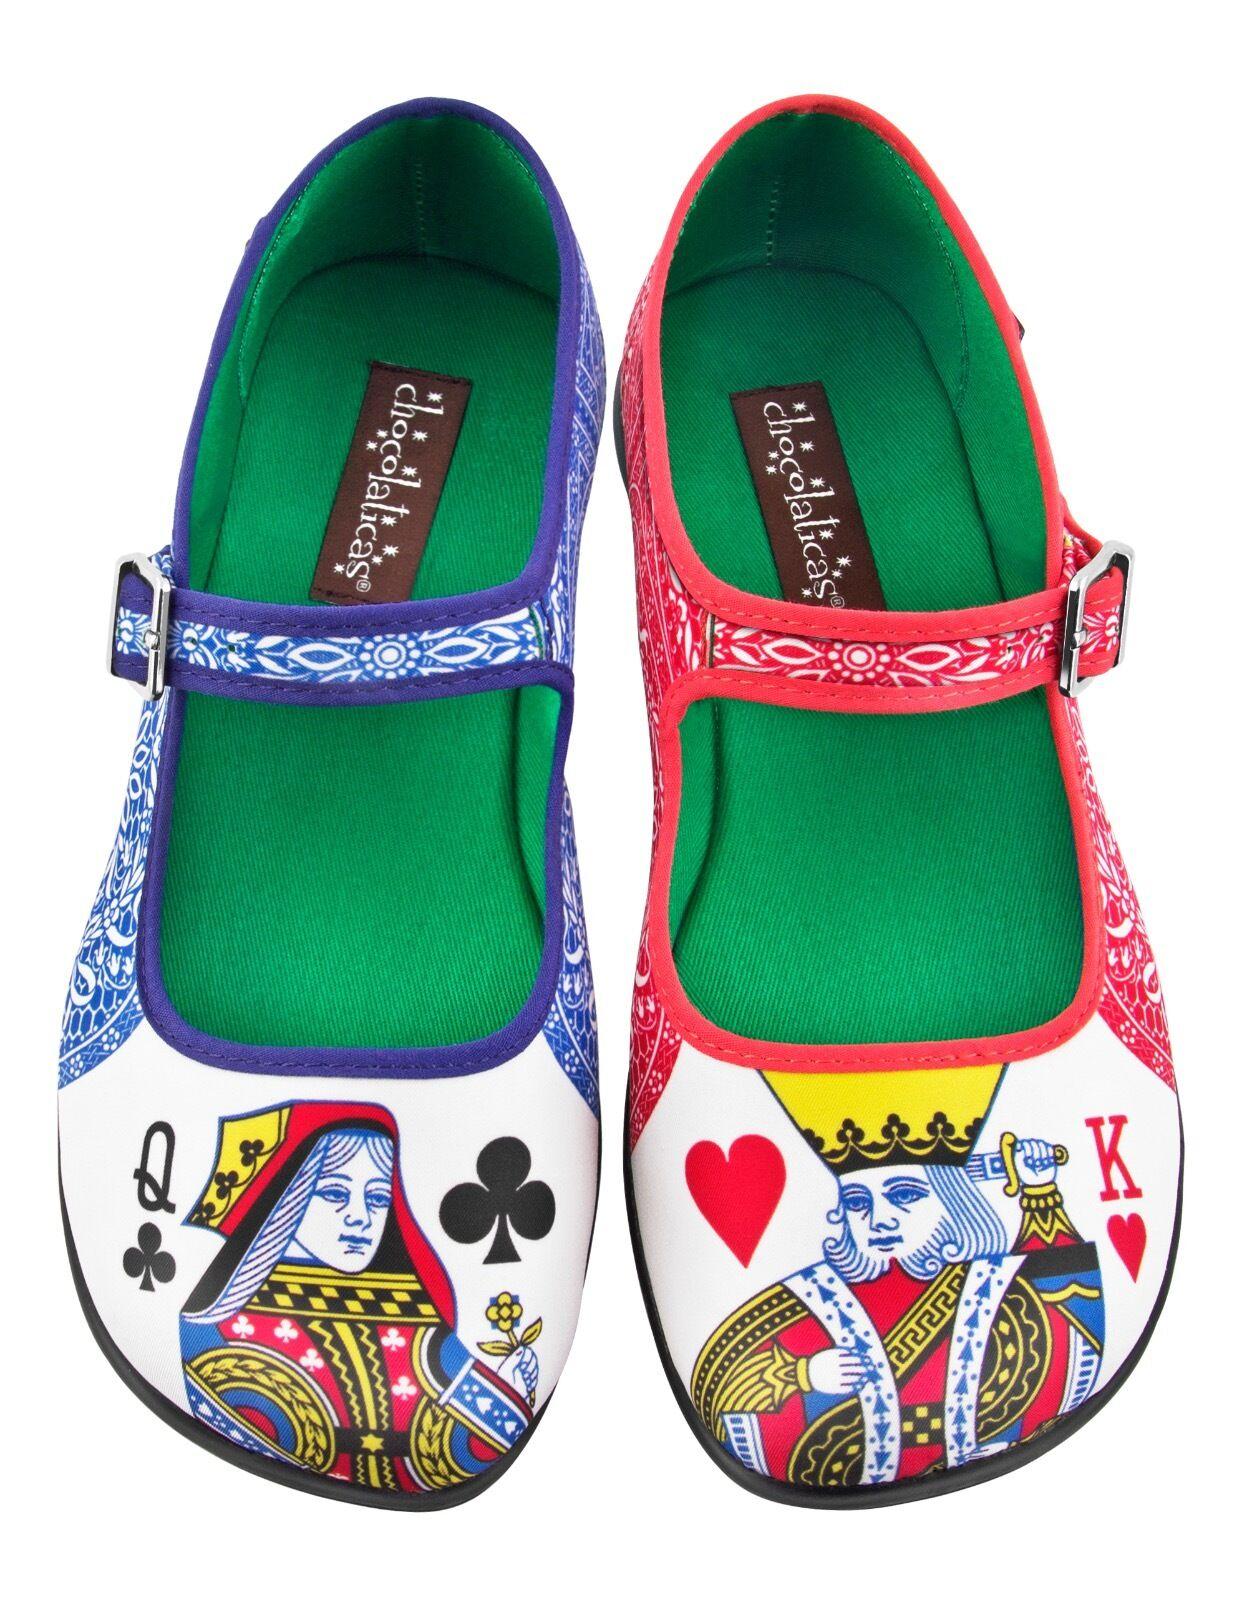 Hot Chocolate Design. Chocolaticas Lady Poker. US 5. Women shoes. Mary Janes